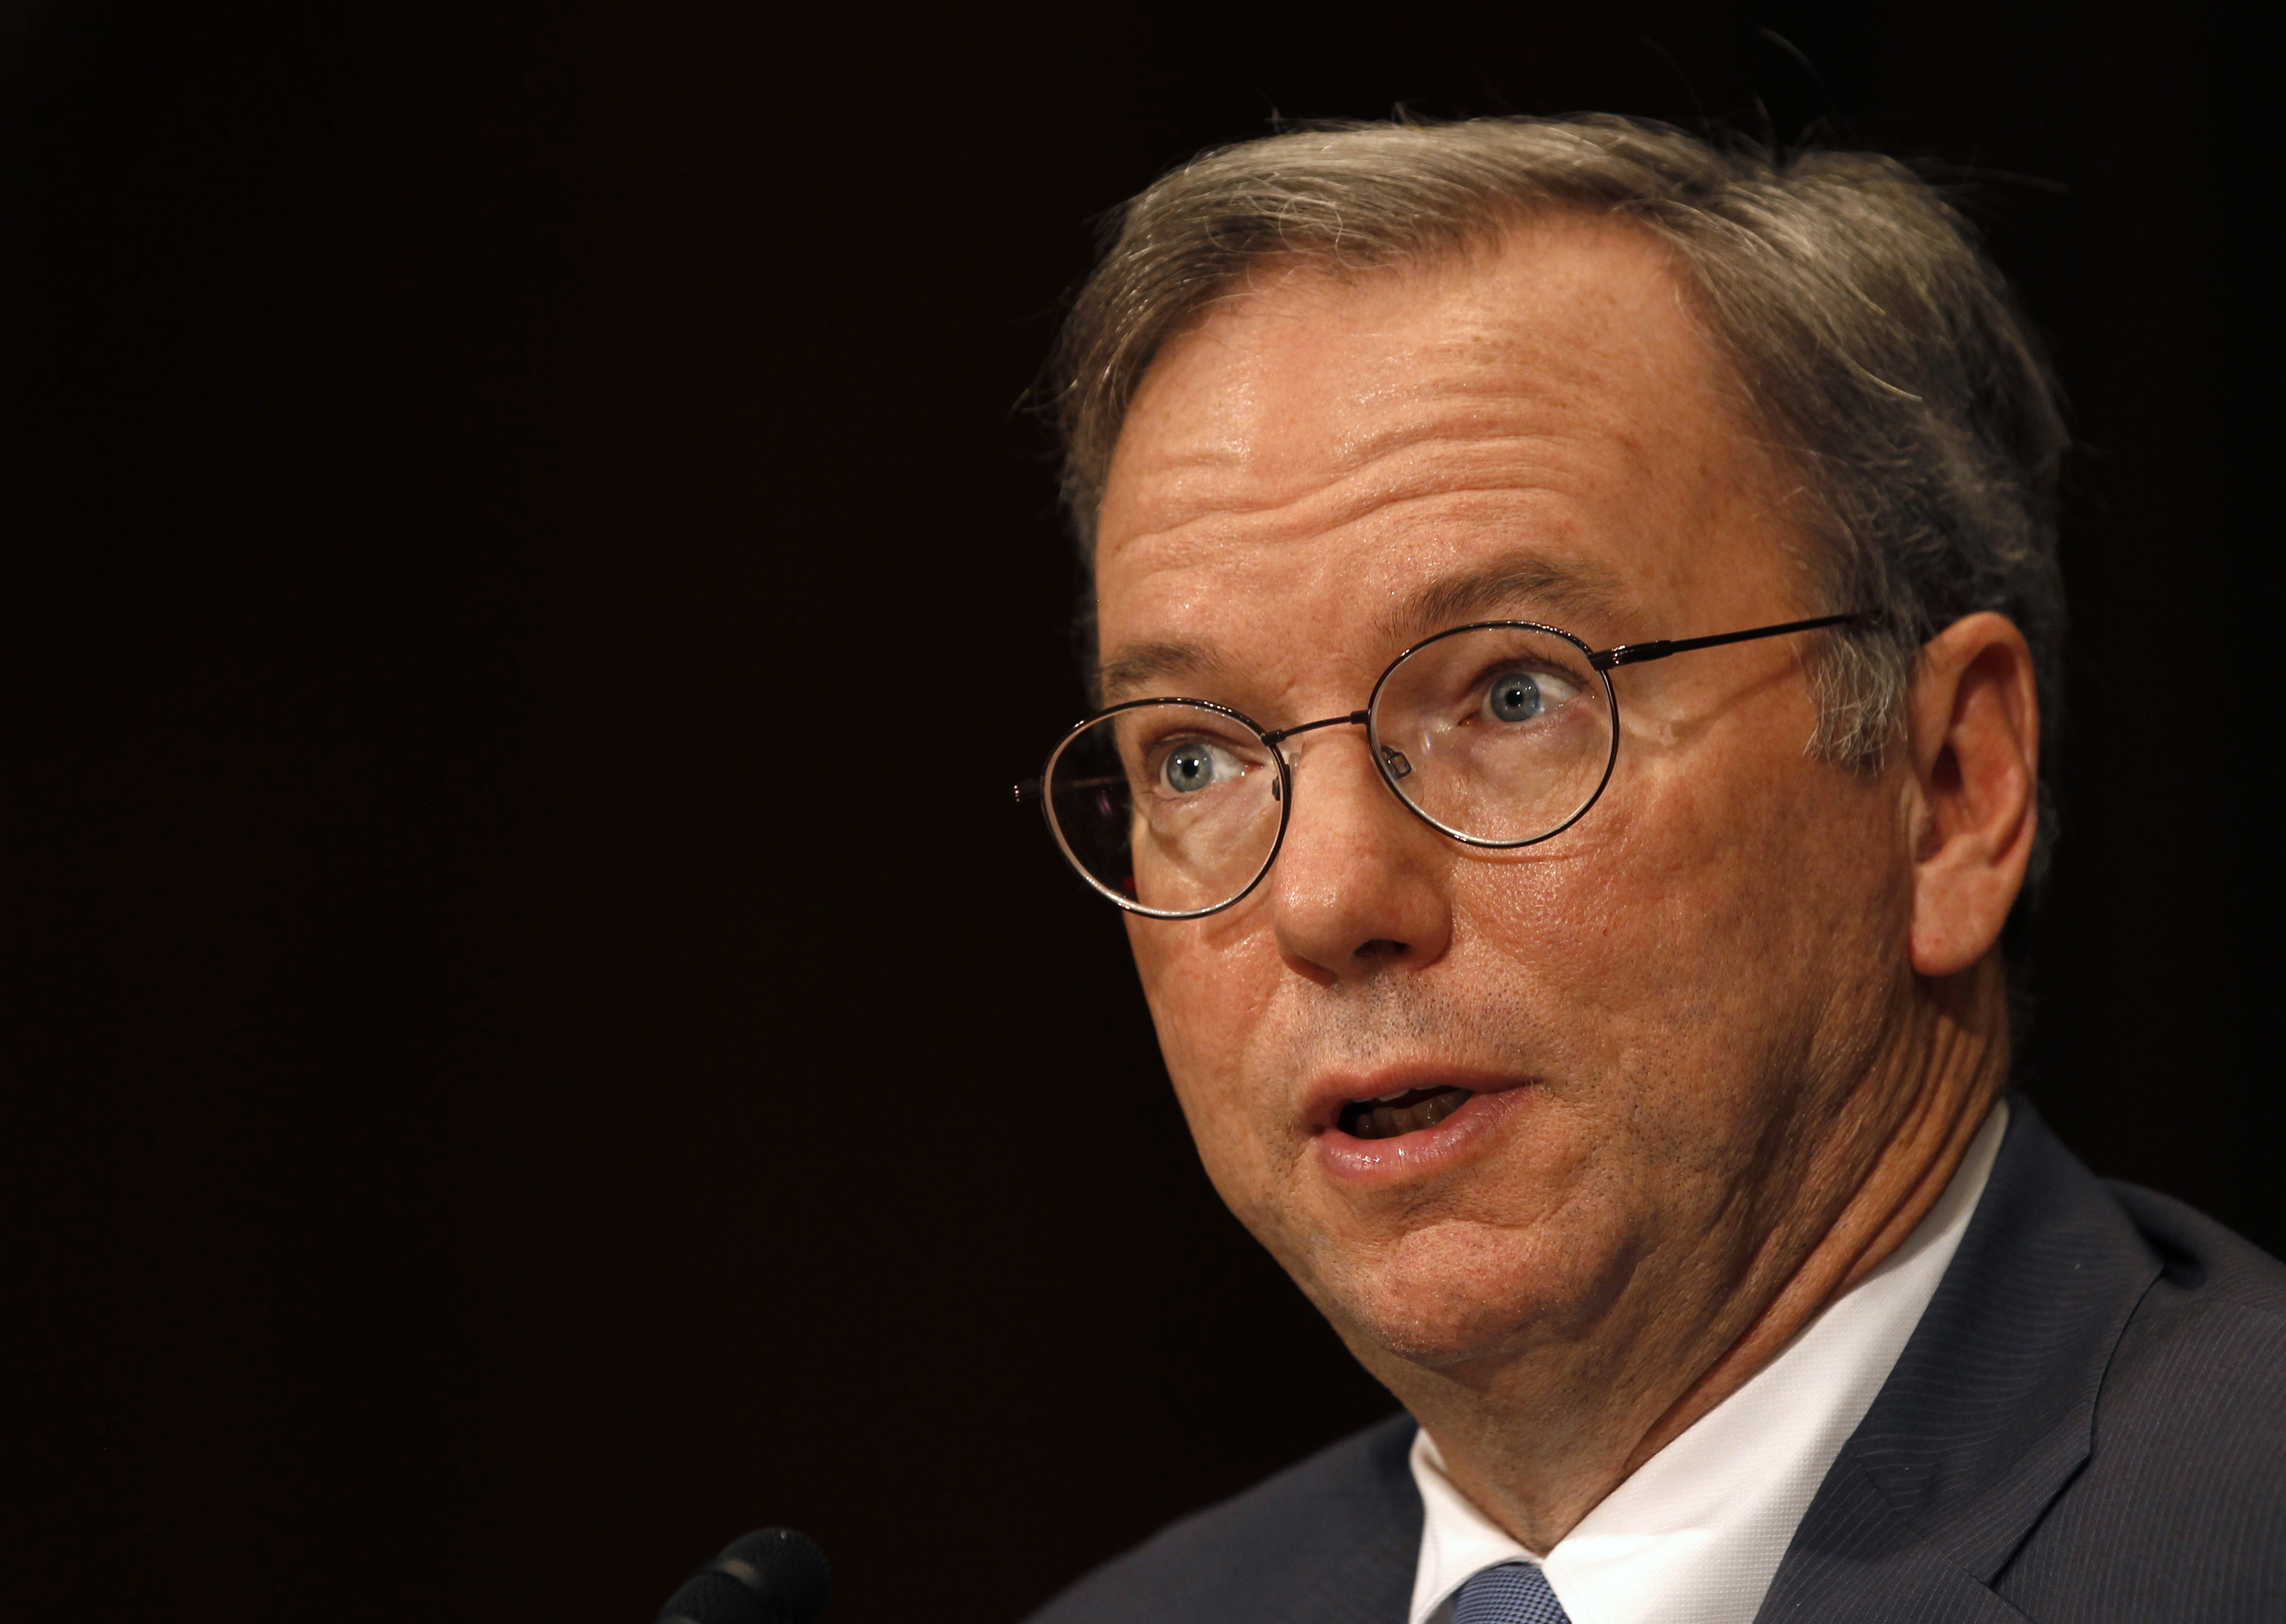 Executive Chairman of Google Eric Schmidt testifies before a Senate Judiciary Subcommittee hearing in Washington